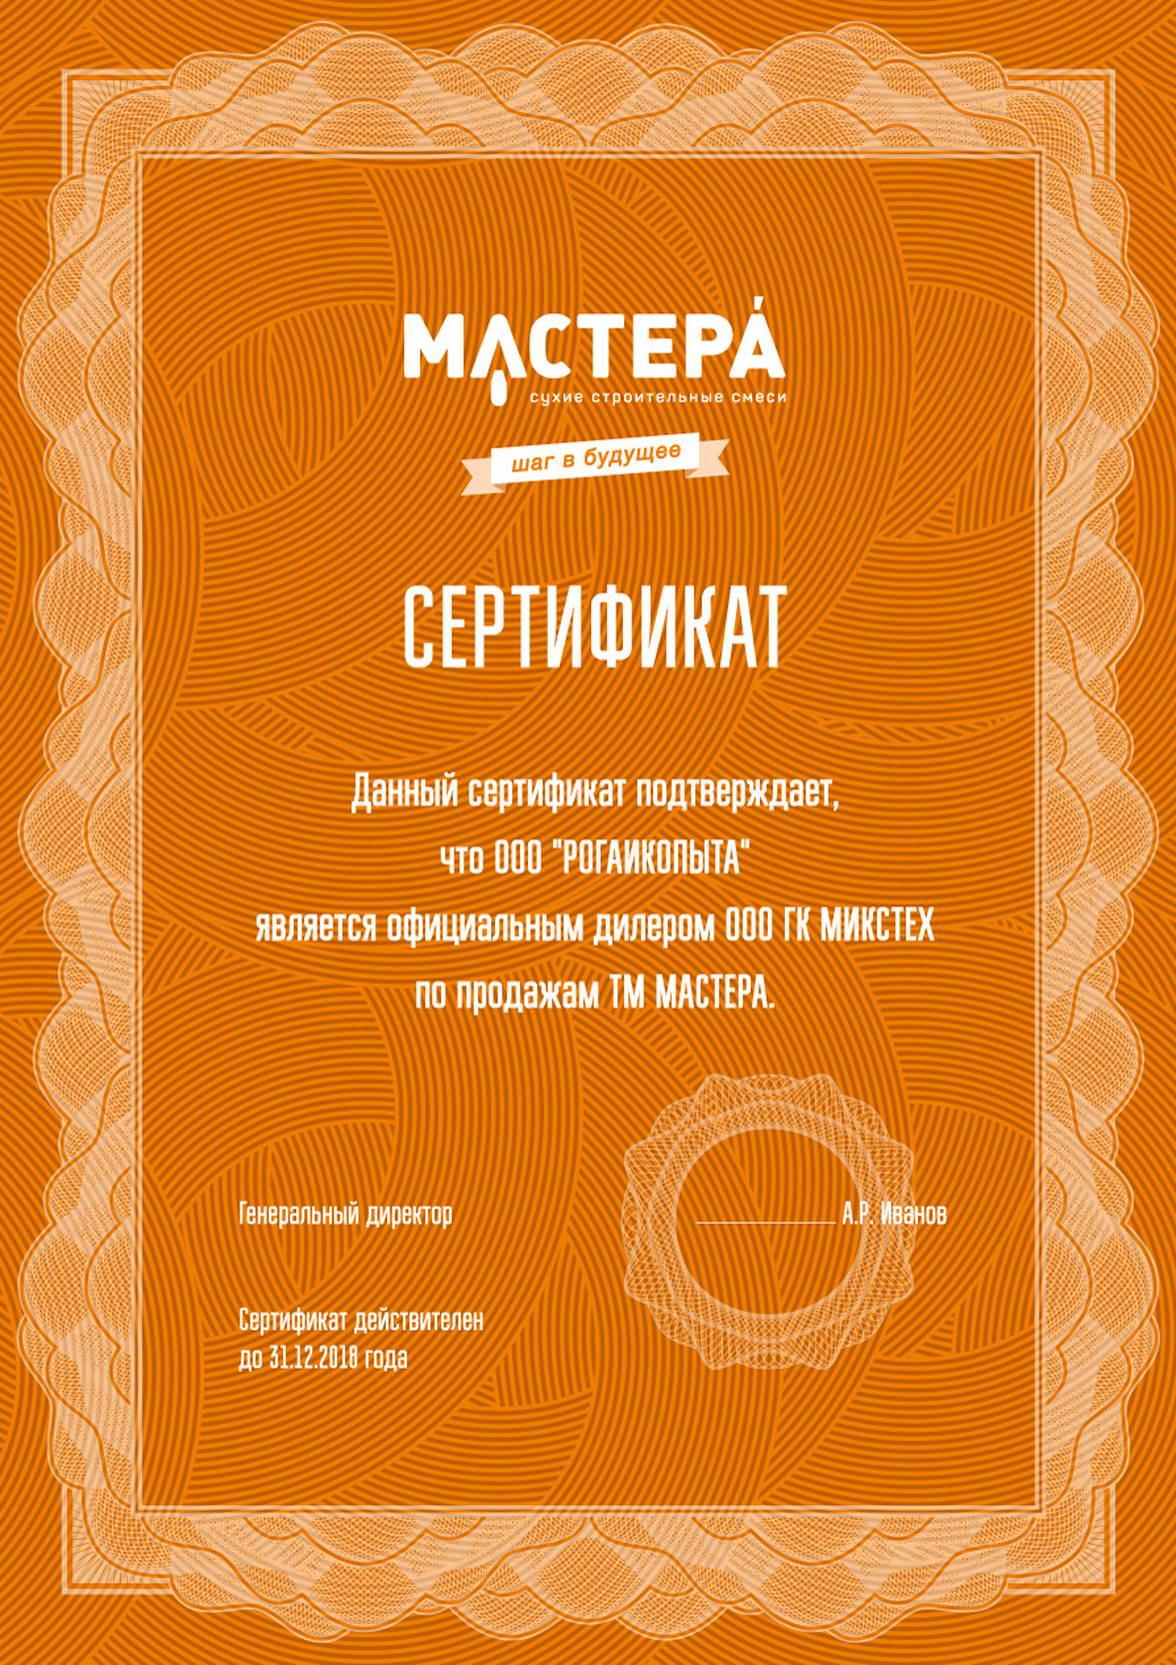 МАСТЕРА сертификат